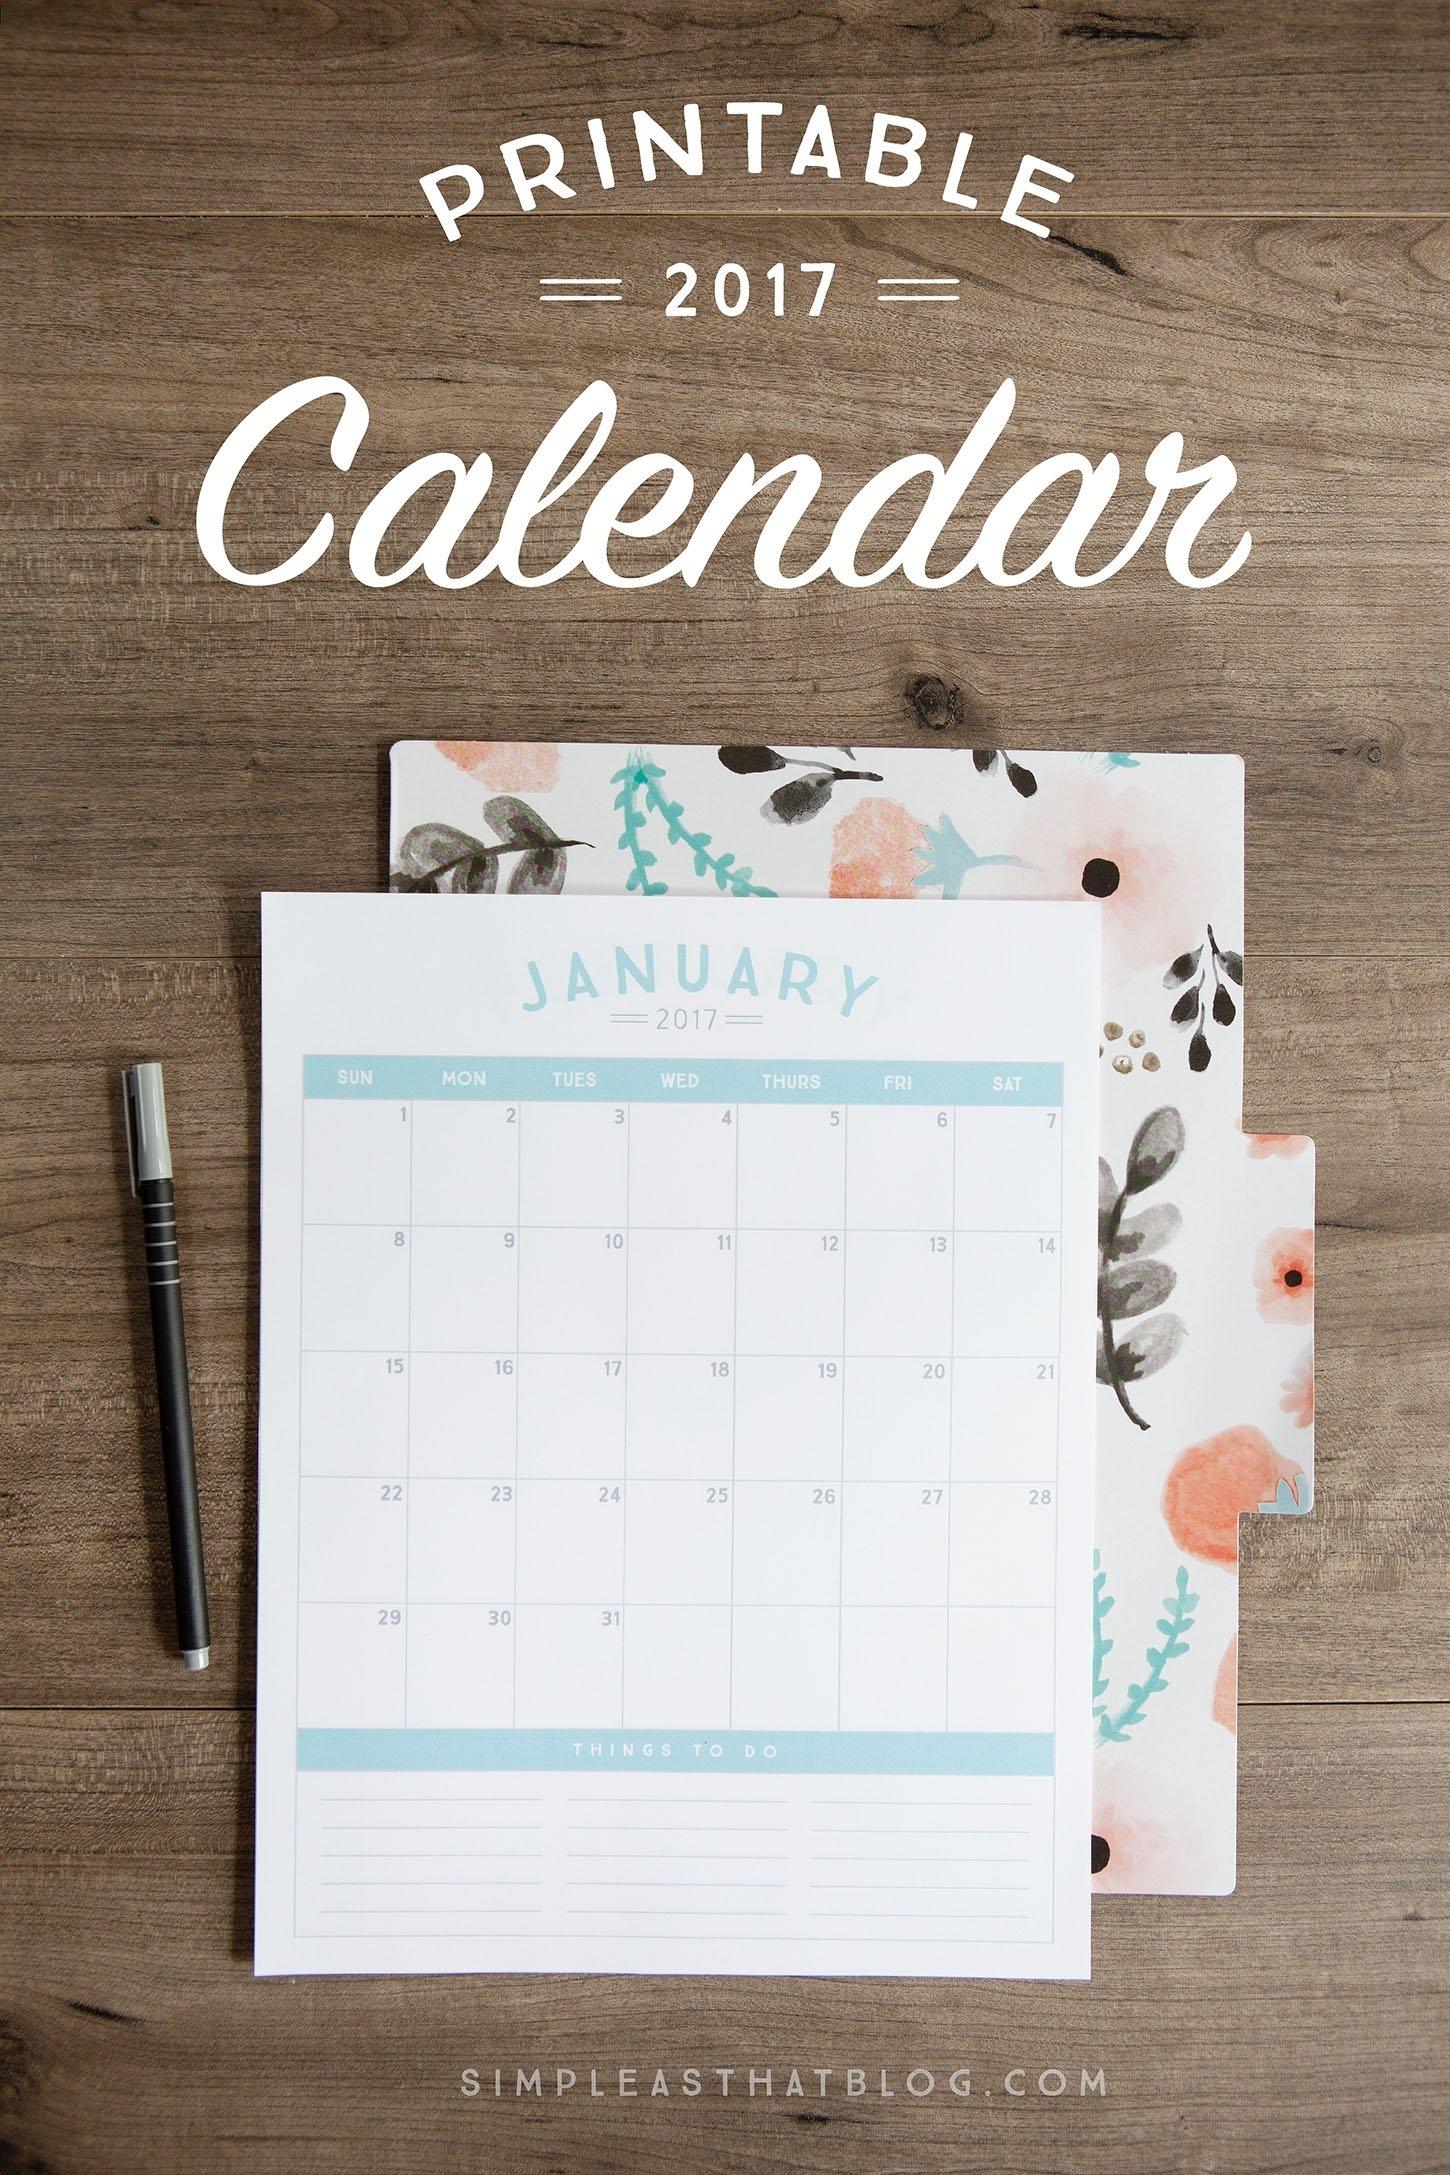 Free Printable Short Timers Calendar   Calendar Template 2020 Create A Short Timers Calender